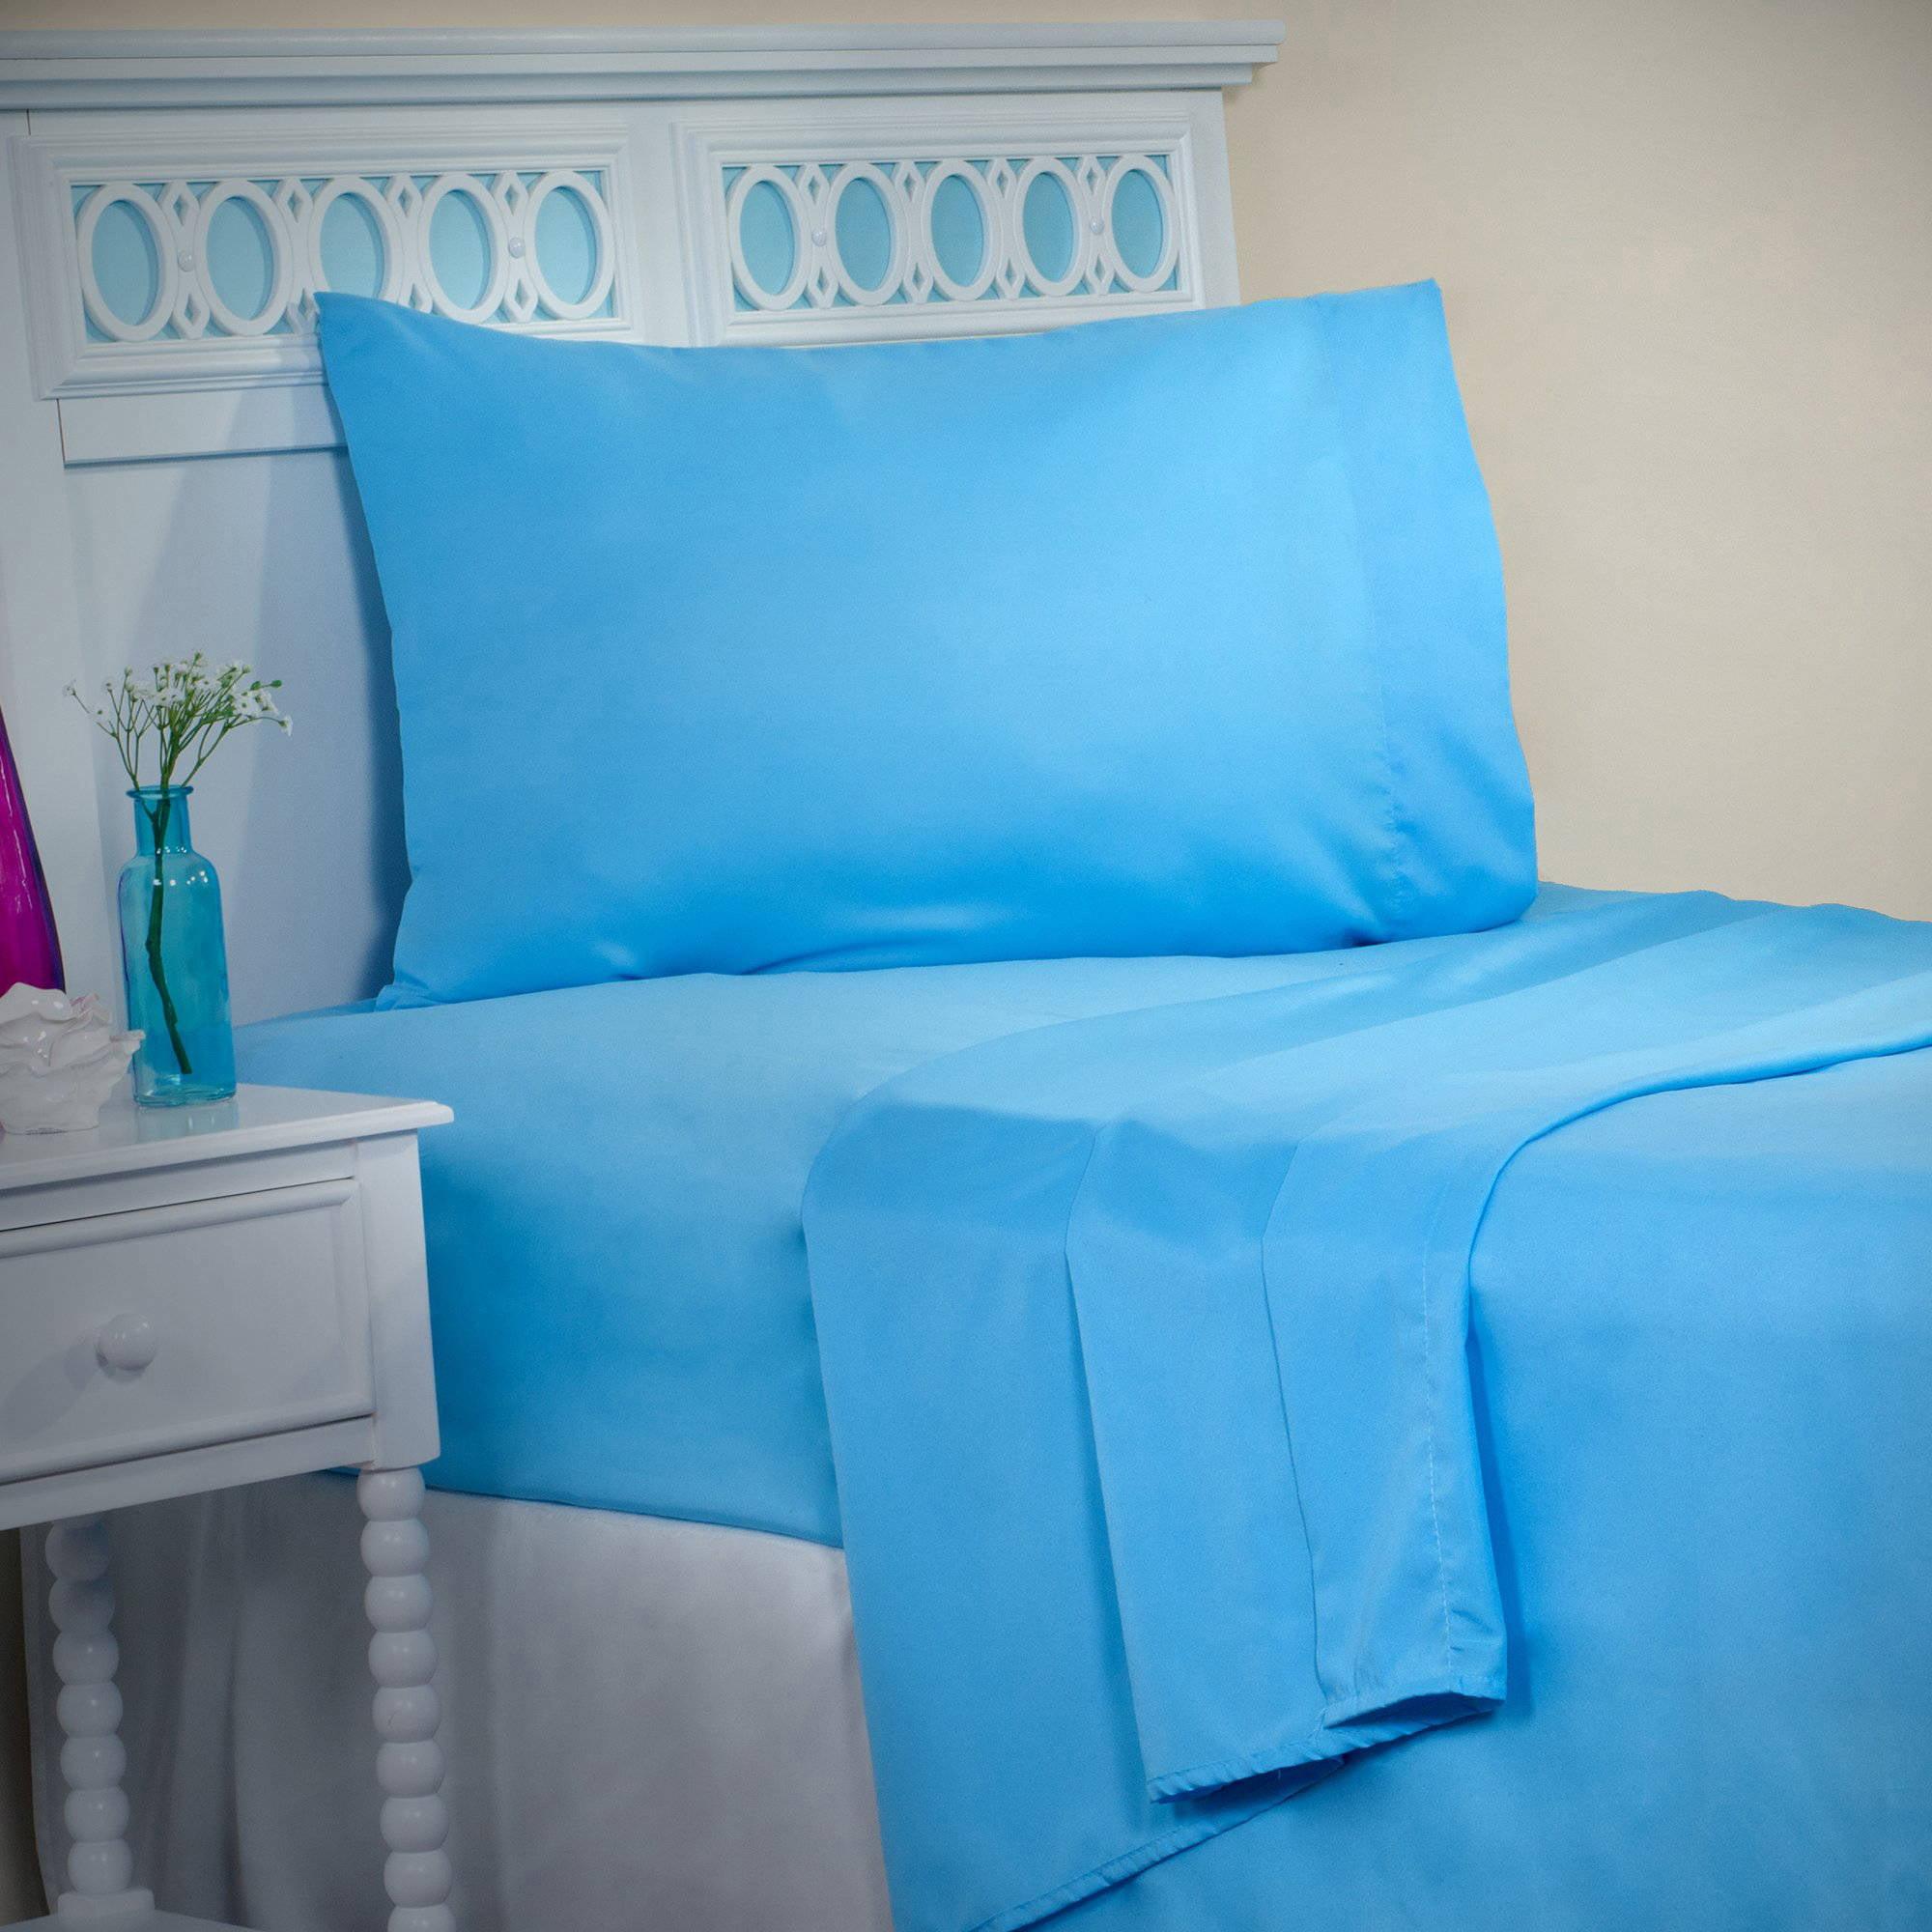 Somerset Home Series 1200 3-Piece Twin SHeet Set, Blue by Trademark Global LLC